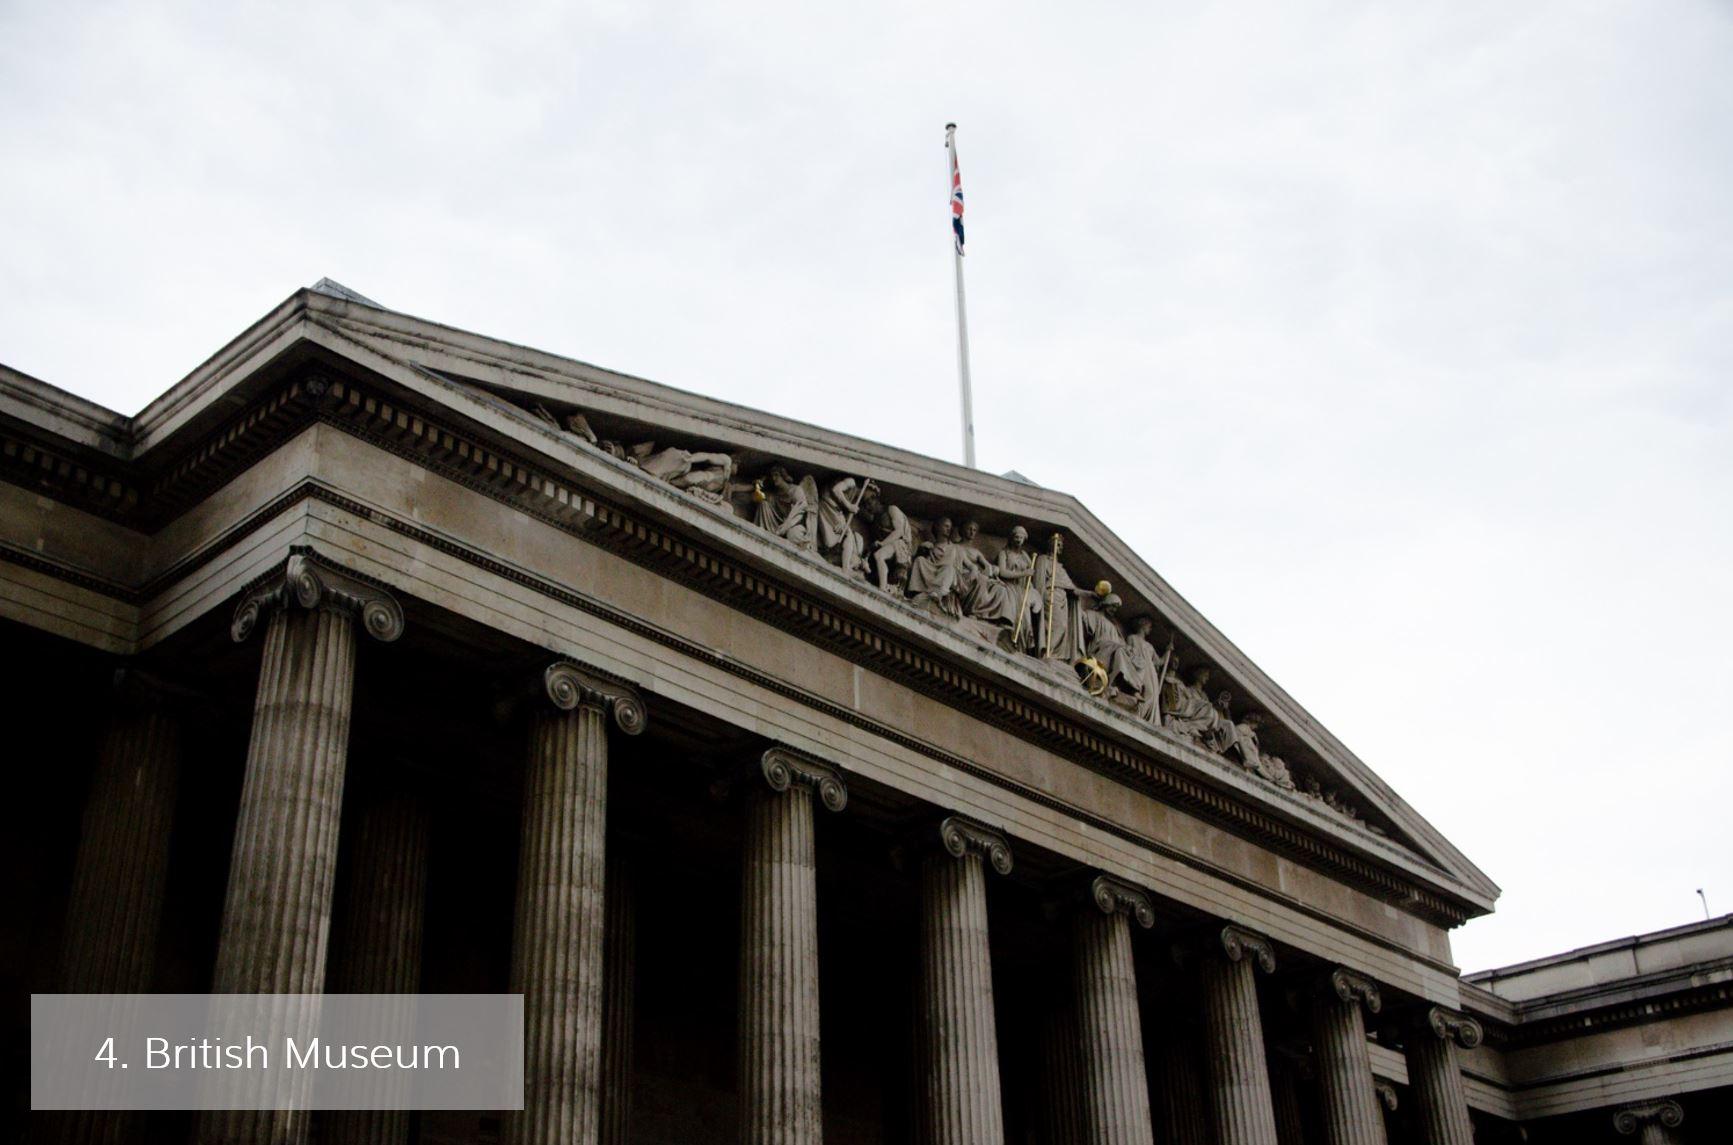 BritishMuseumm